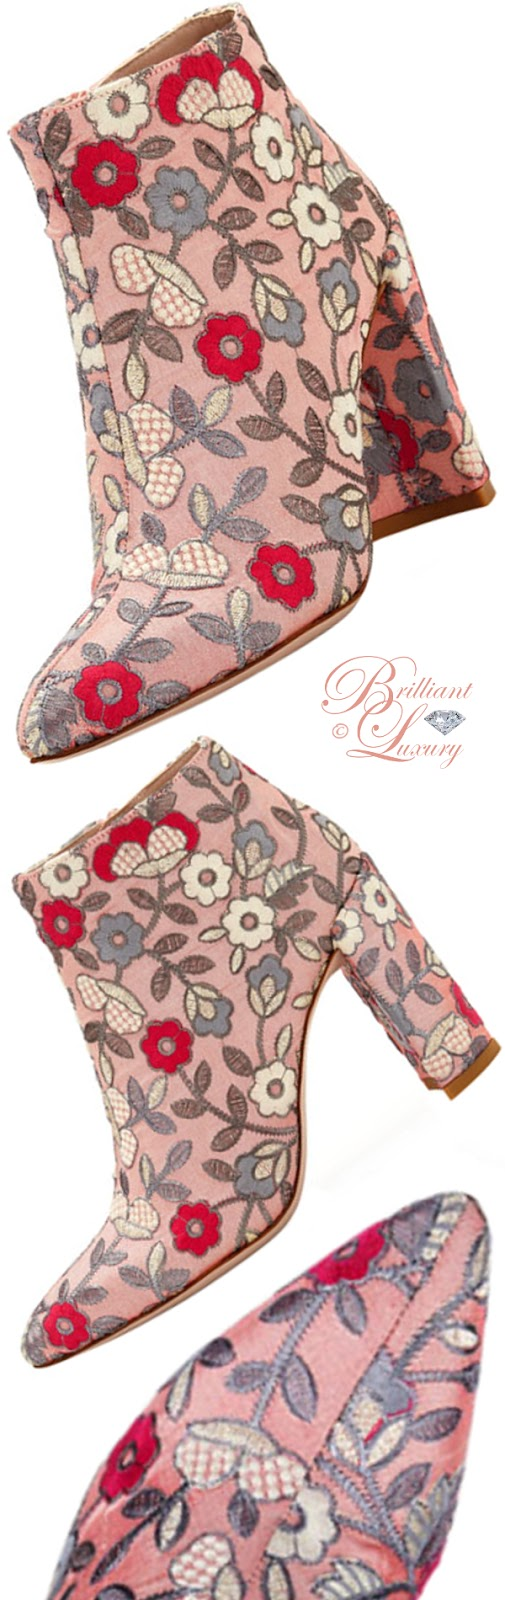 Brilliant Luxury ♦ Stuart Weitzman embroidered booties